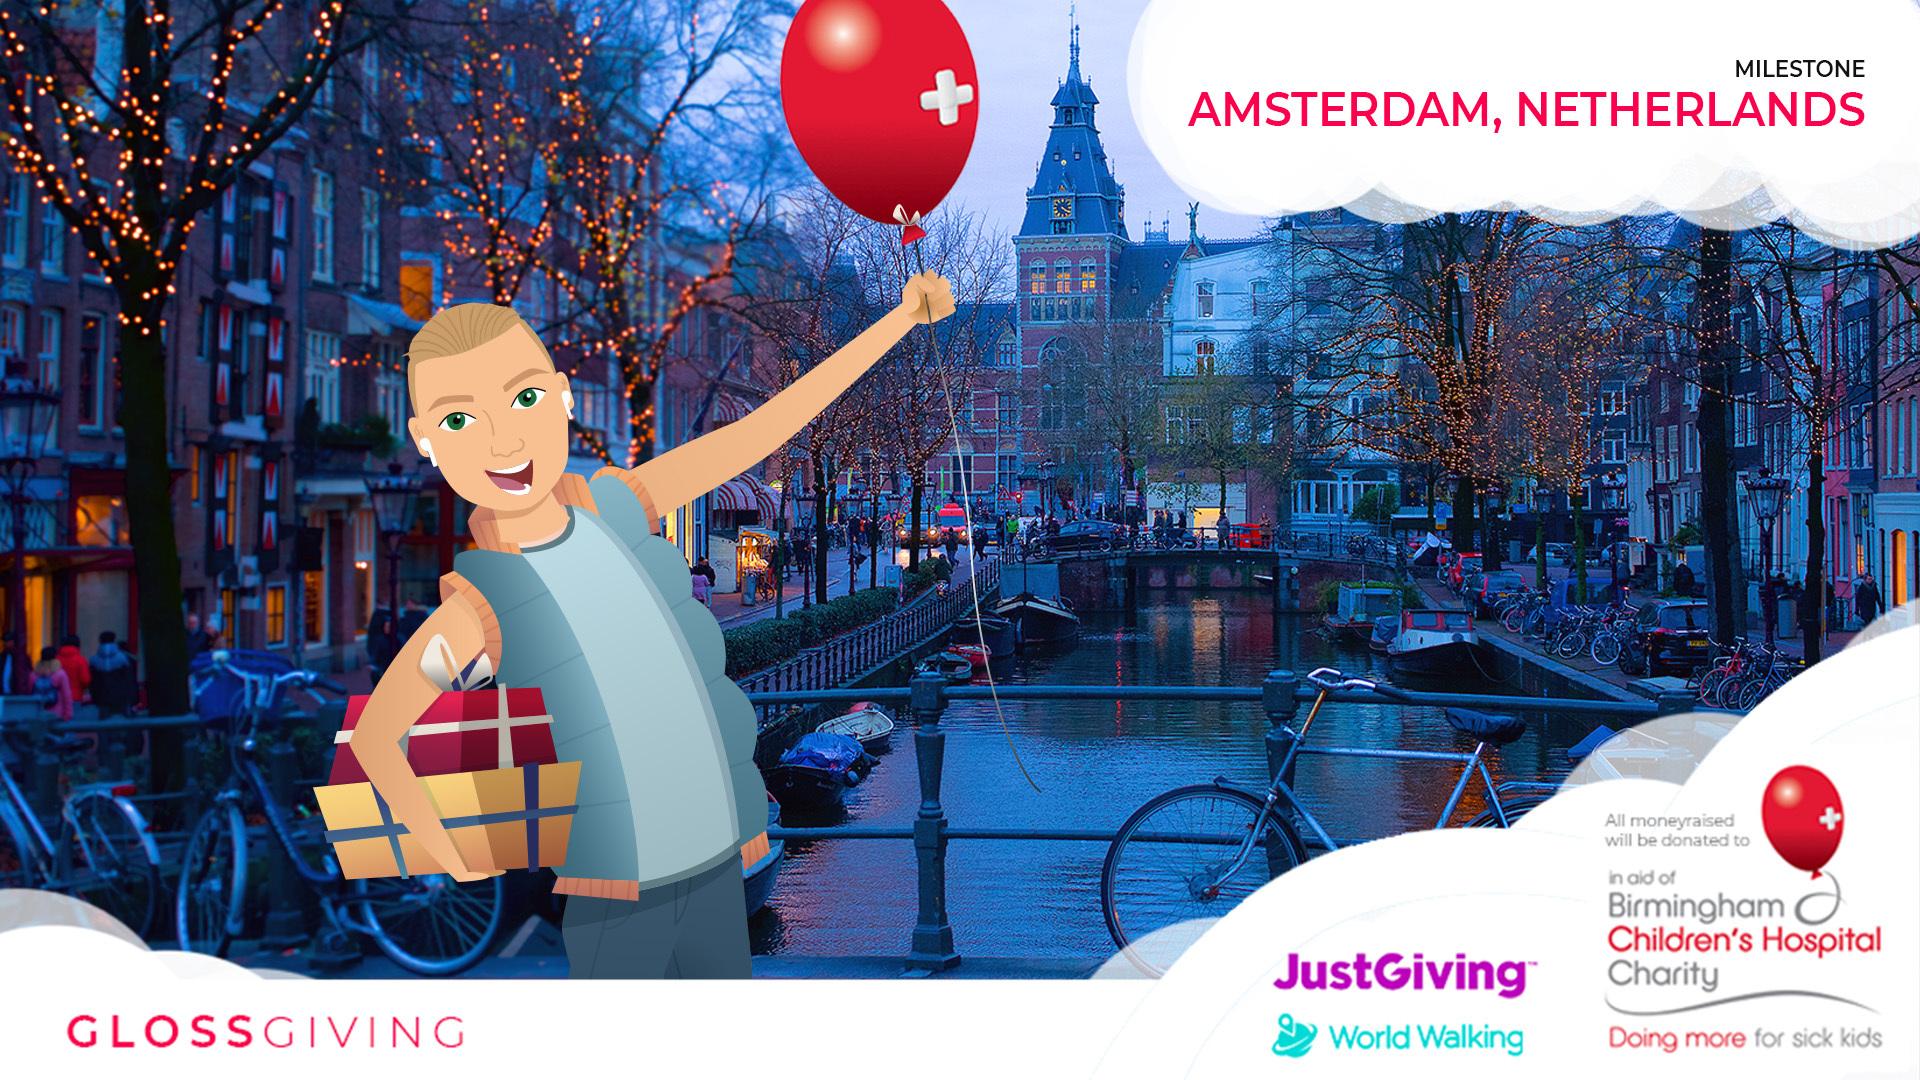 Amsterdam milestone for Birmingham Children's Hospital